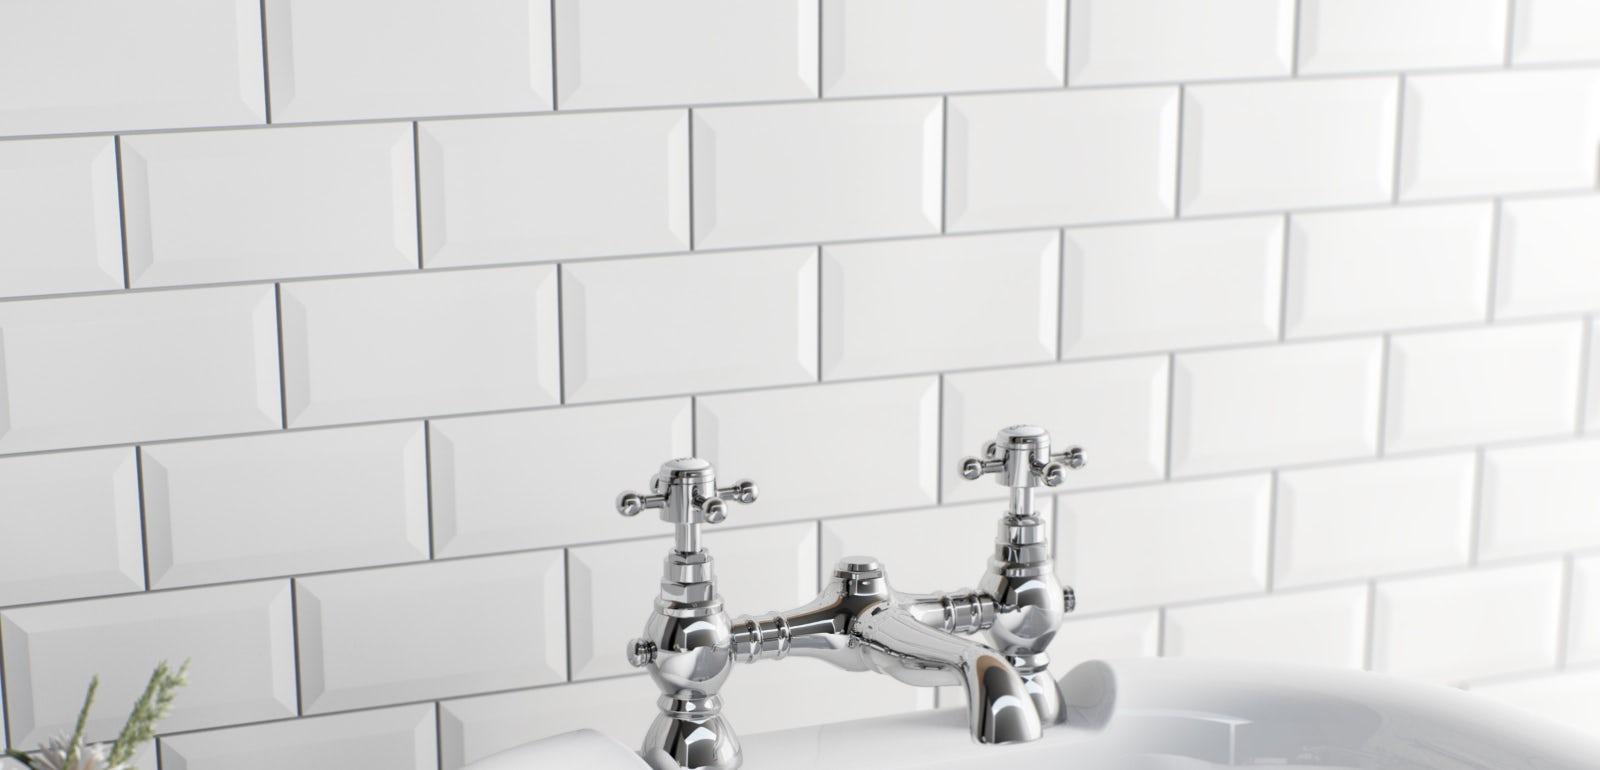 100 bath mixer taps with shower designer italian bath mixer bath mixer taps with shower rubber mixer tap shower attachment sometimes itus the shower arm